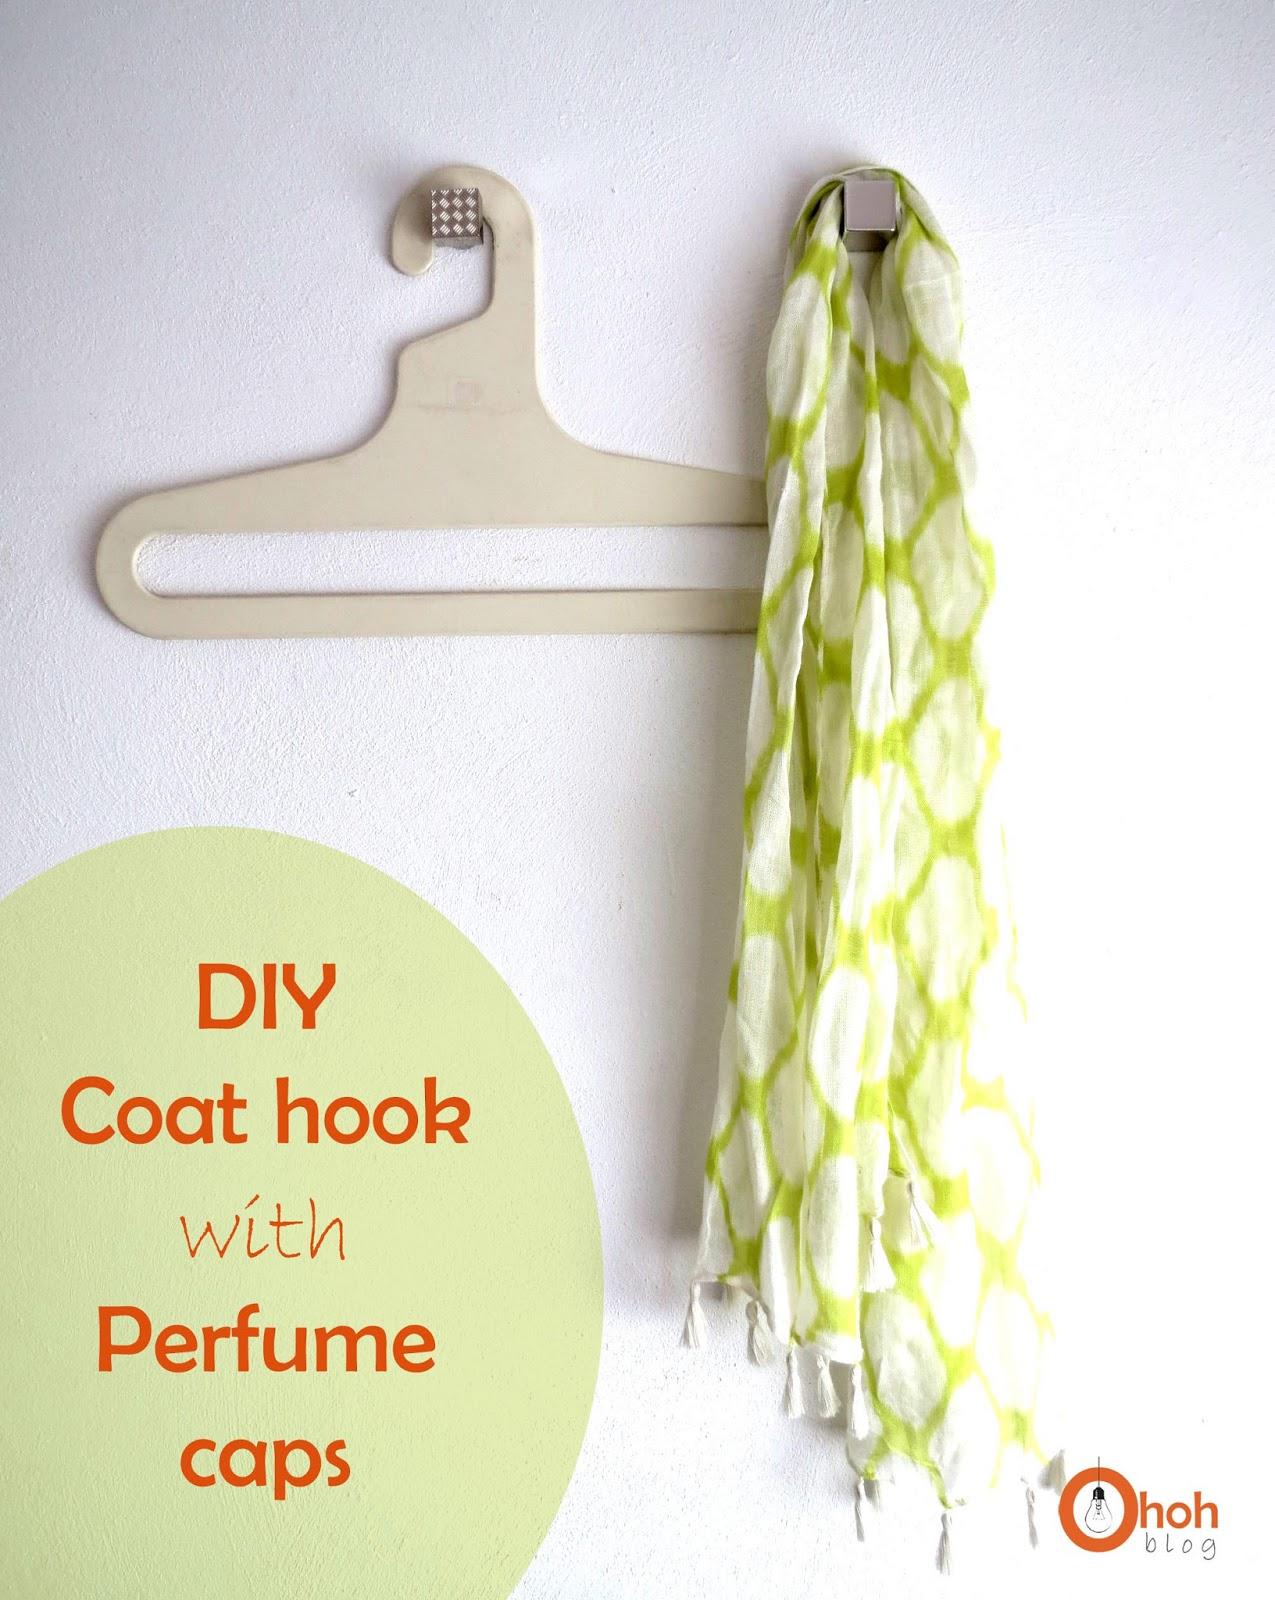 Diy tote bag ohoh blog diy and crafts - Diy Coat Hook Ohoh Blog